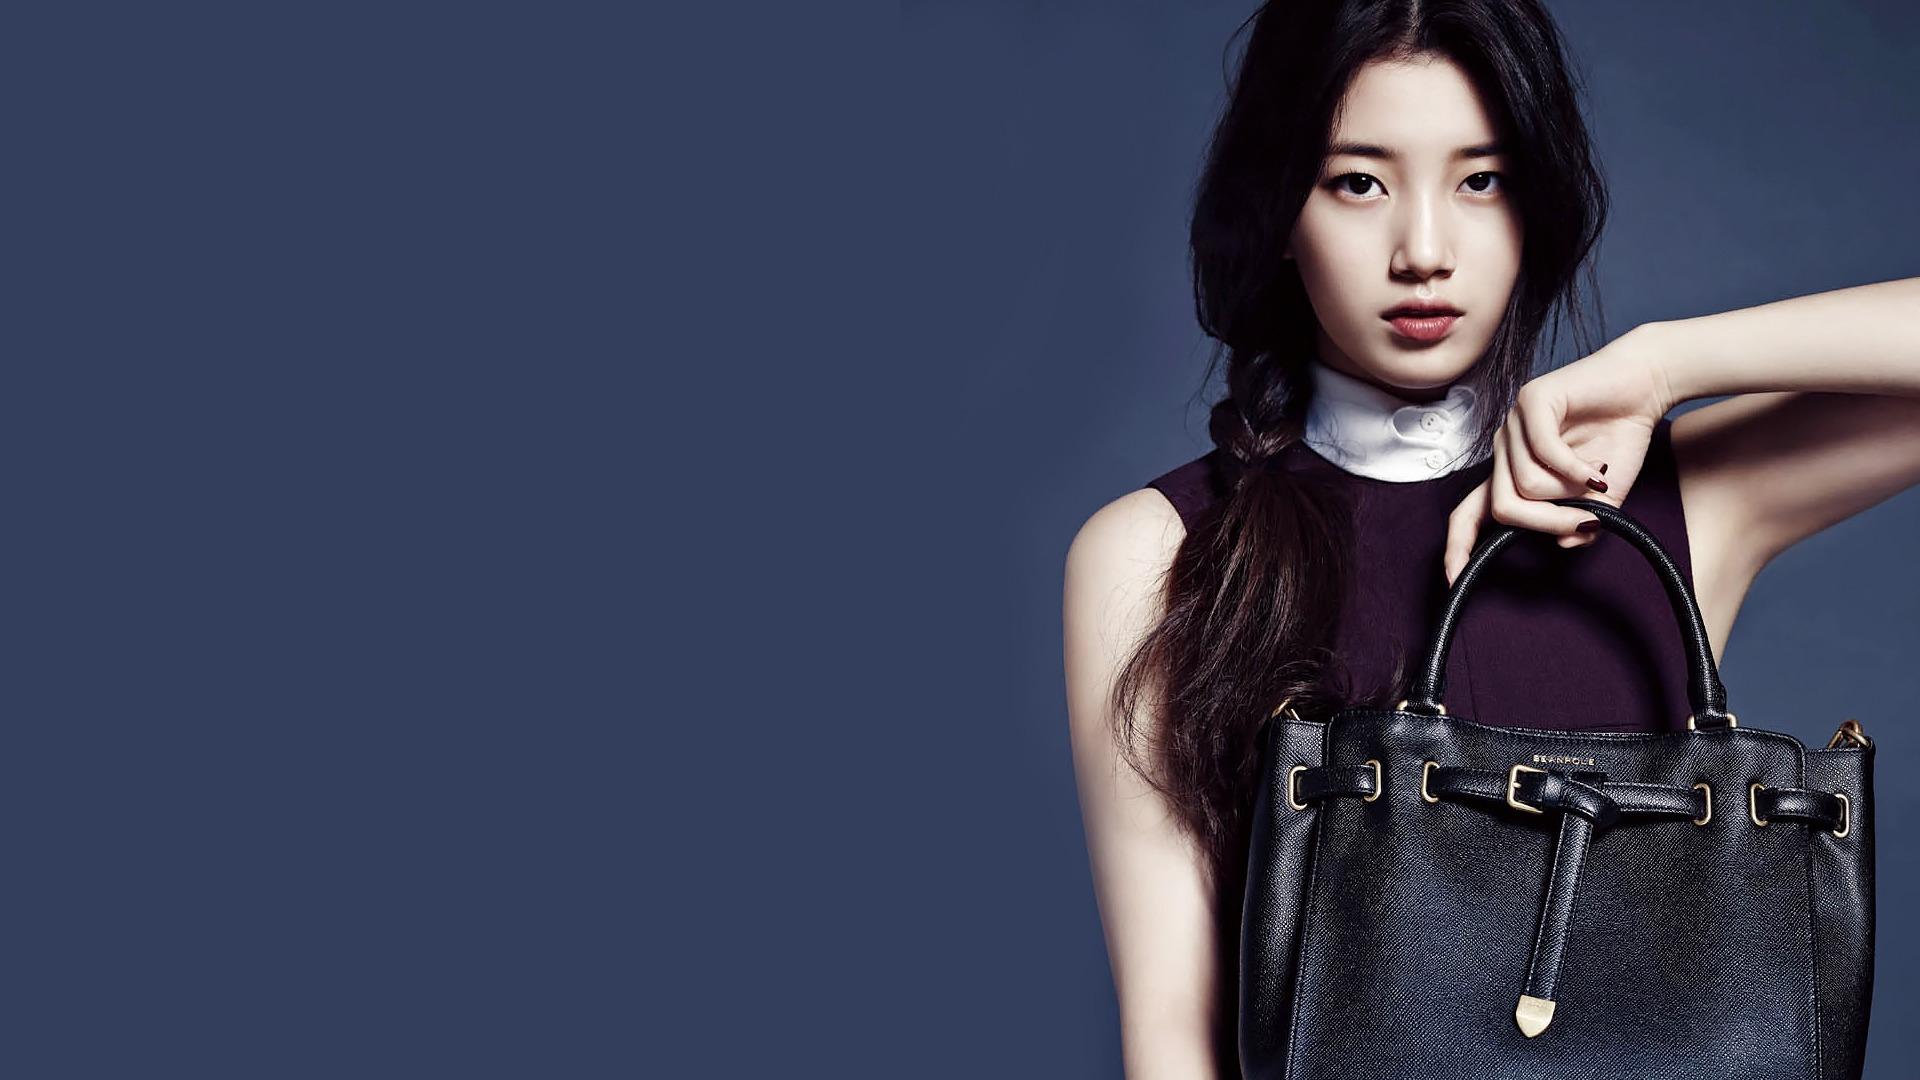 Suzy Korean girls photo HD wallpaper 17 Preview